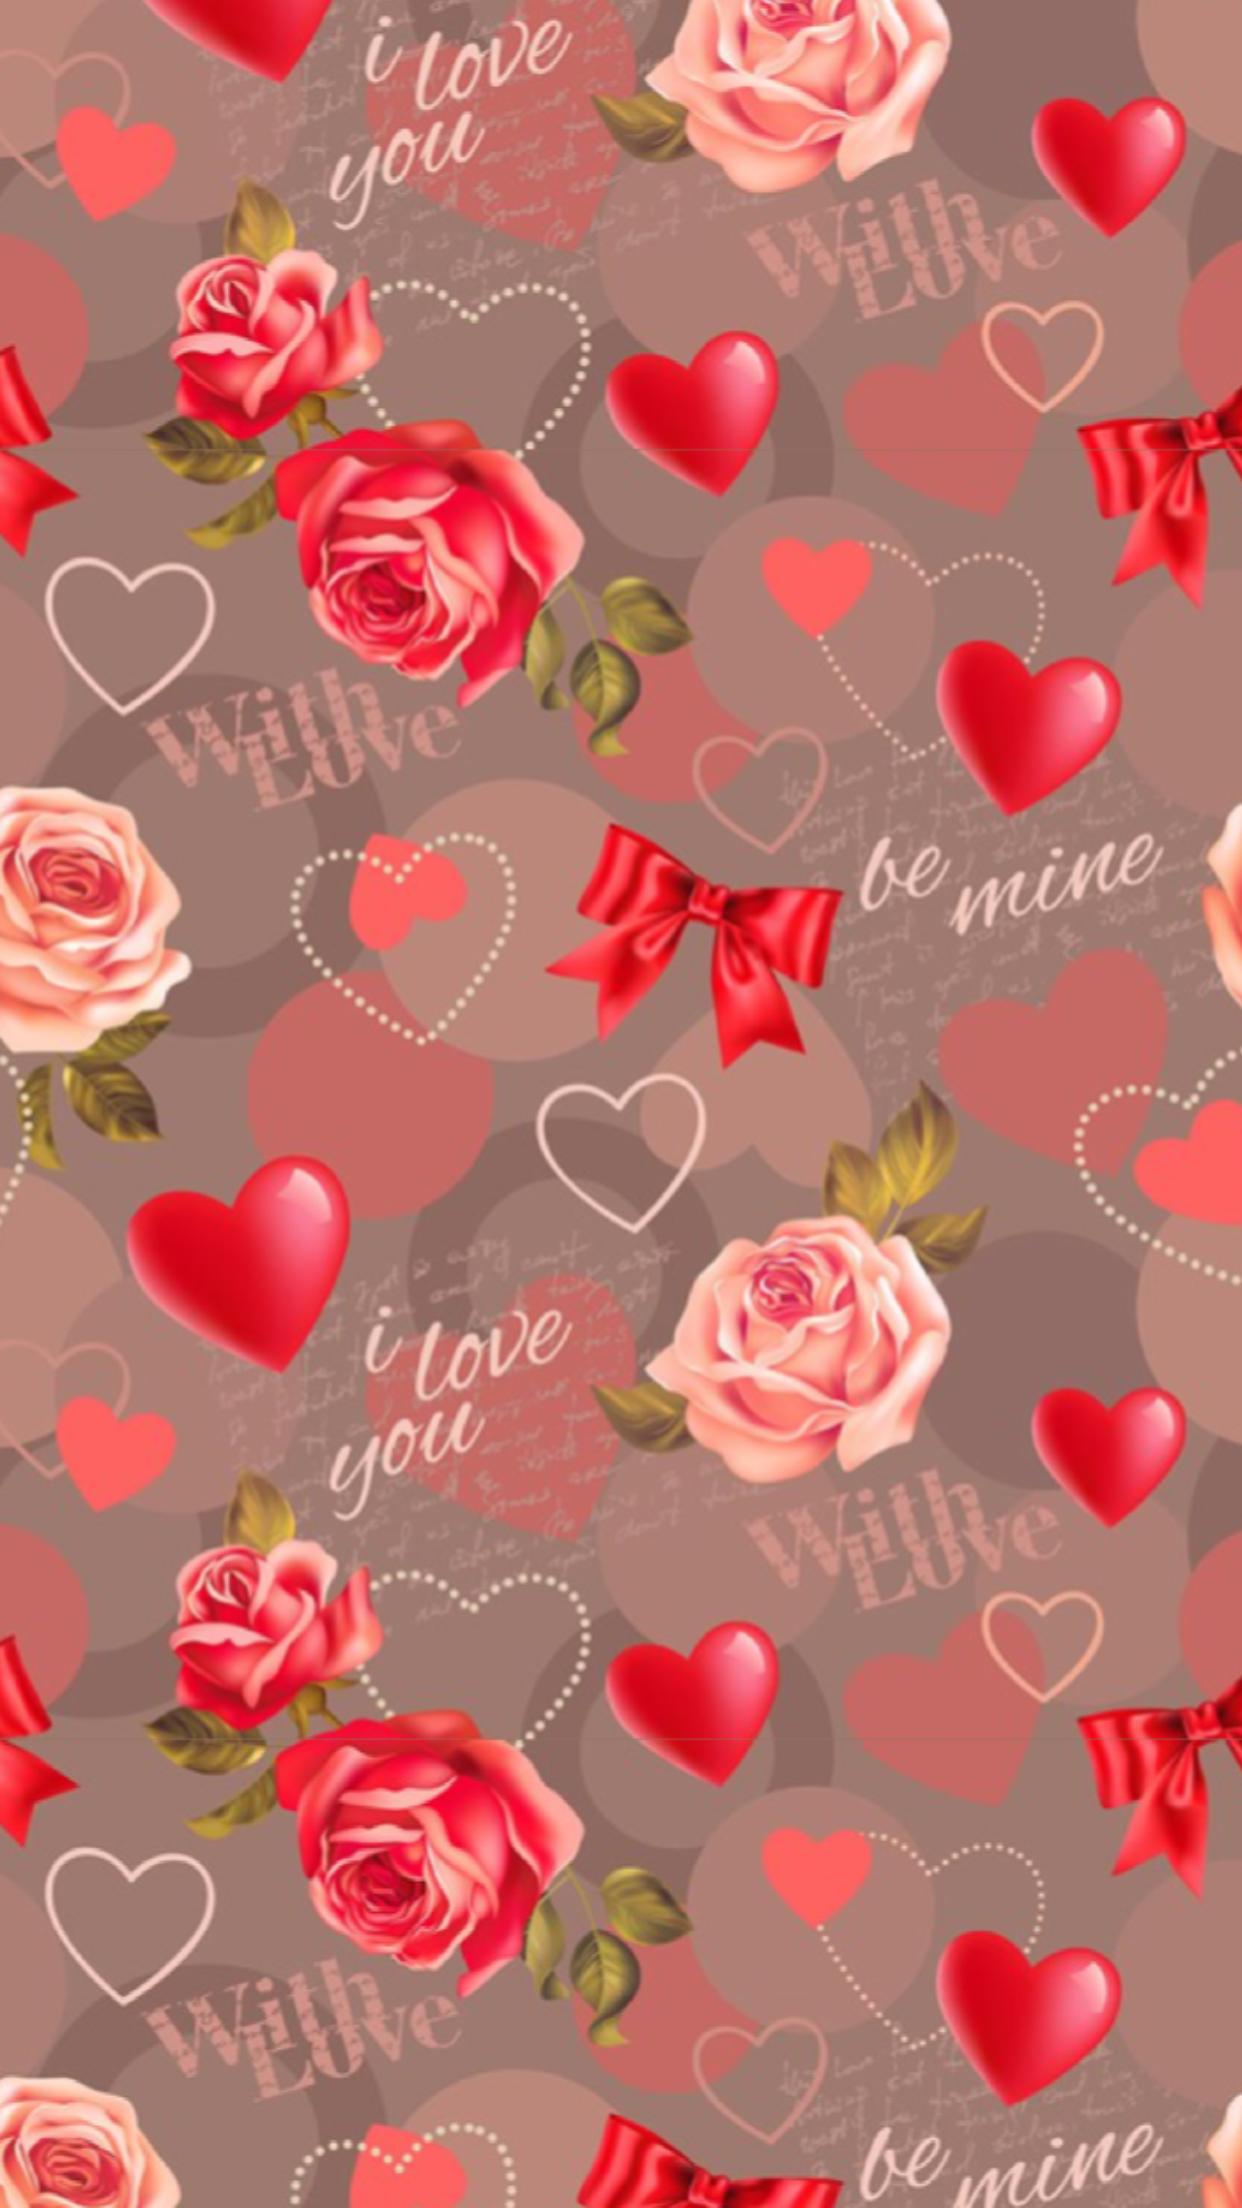 1920x1200 Valentine Day Wallpaper For Desktop Background Free Download Valentines Wallpaper Free Valentine Wallpaper Wallpaper For Computer Backgrounds